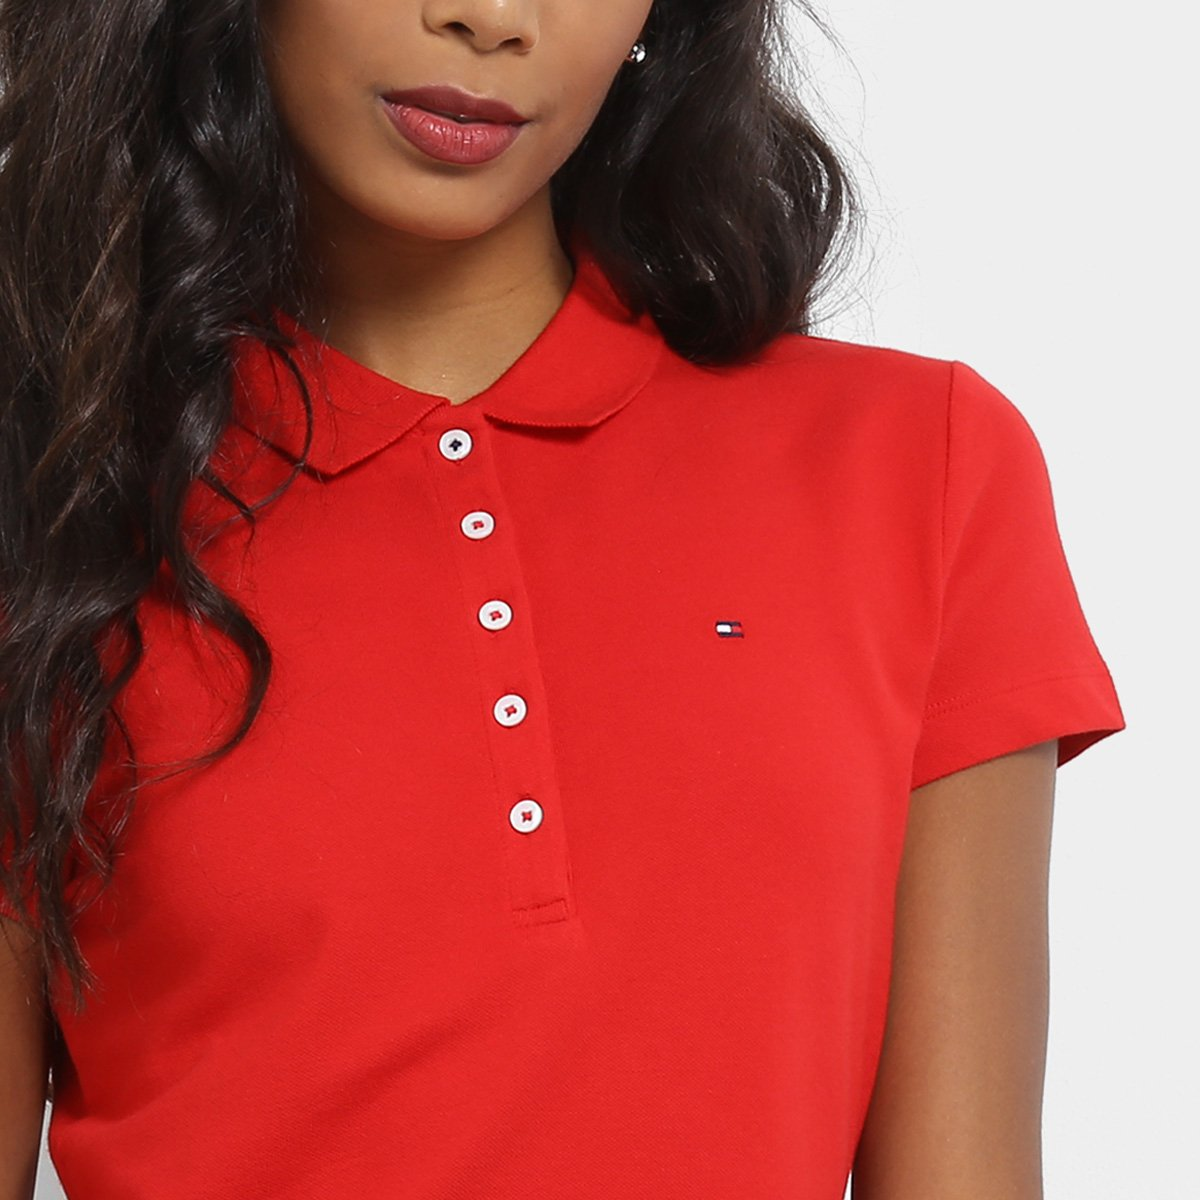 504e51f7db Camisa Polo Tommy Hilfiger Básica Feminina - Compre Agora